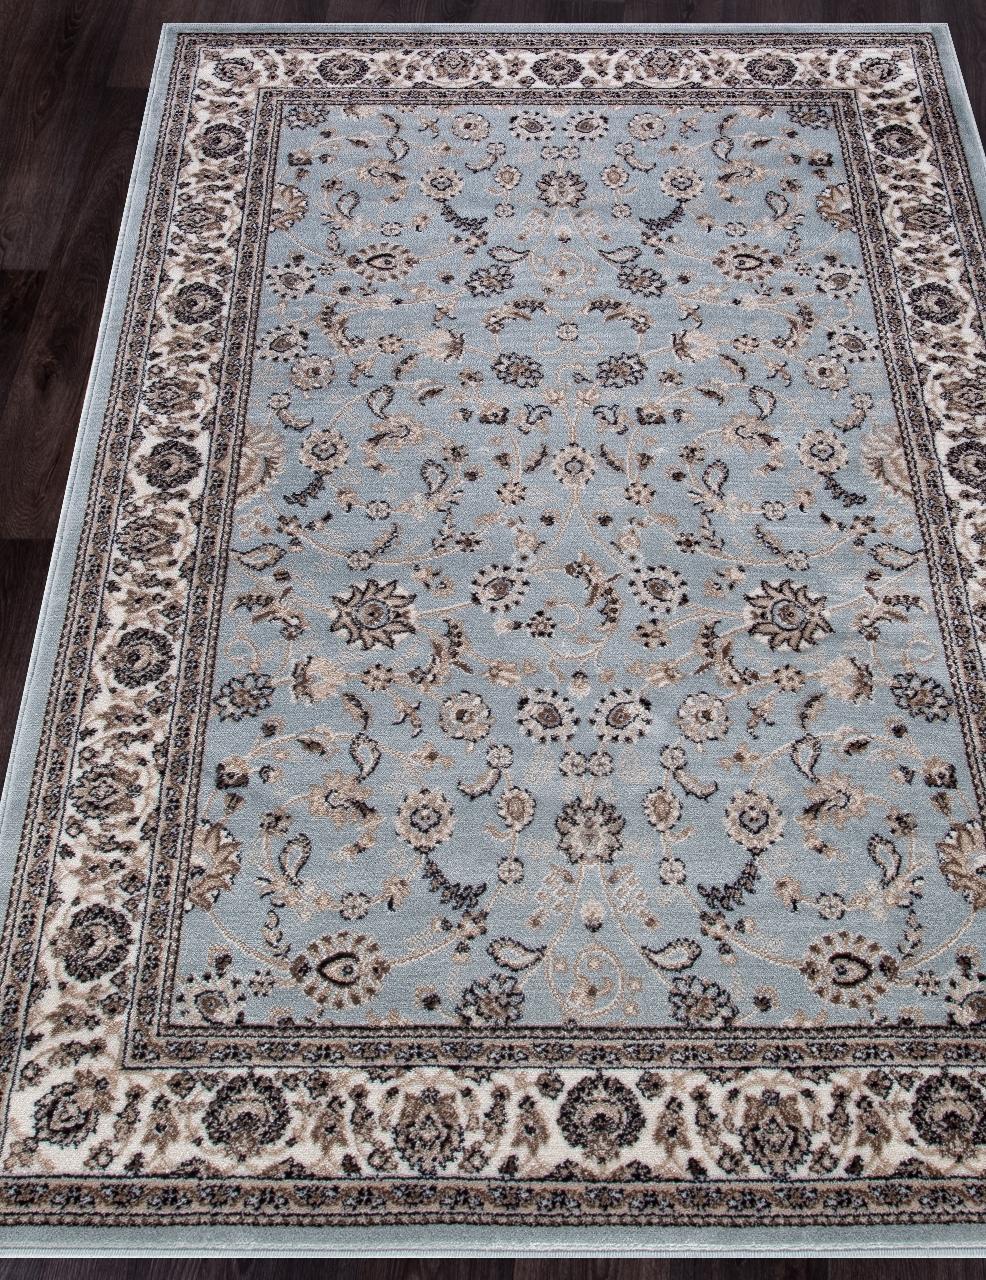 Ковер d251 - L.BLUE-BROWN - Прямоугольник - коллекция VALENCIA DELUXE - фото 1